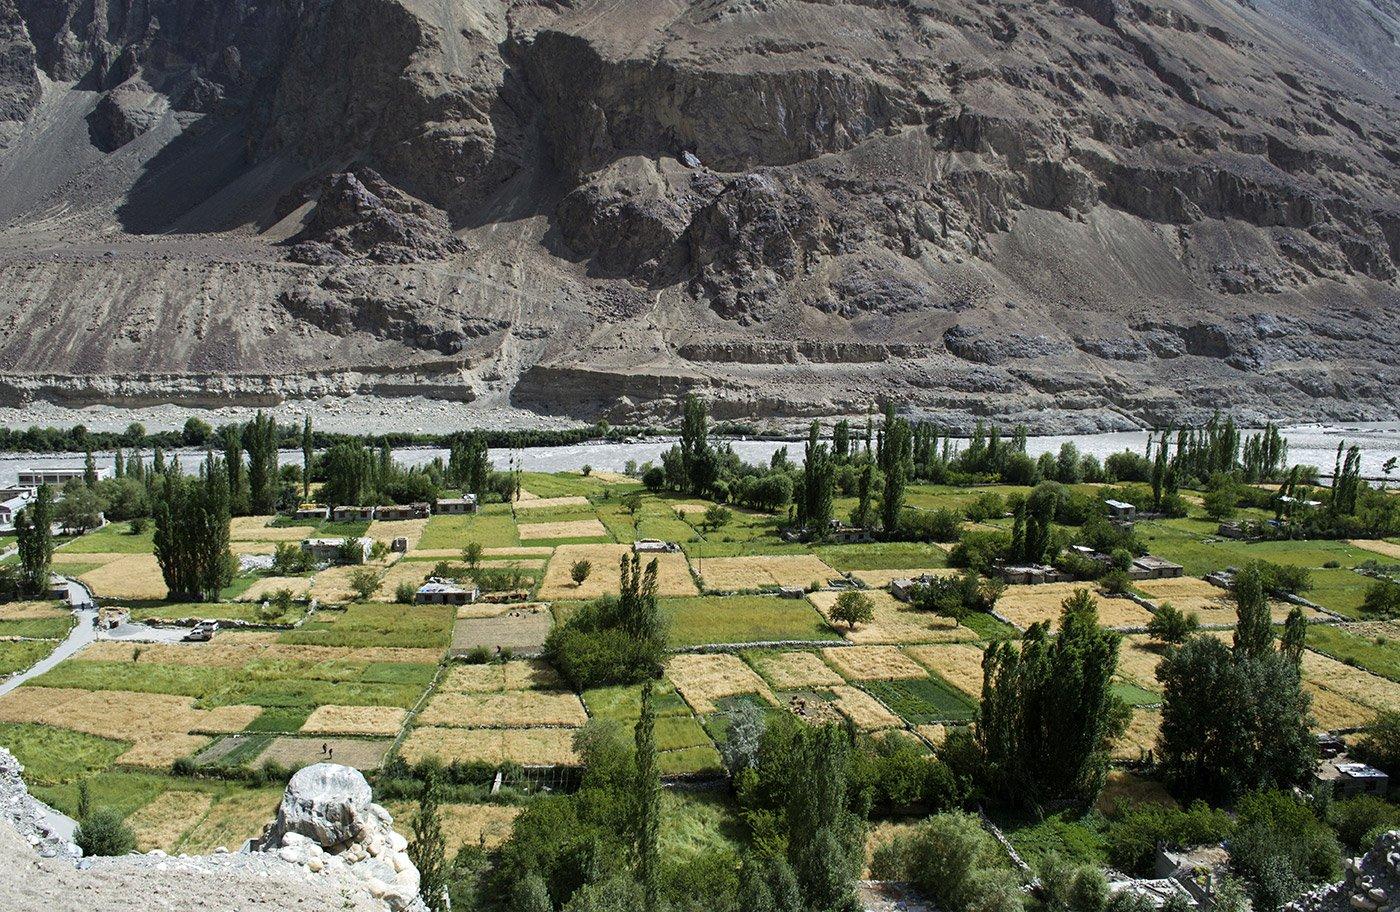 Turtuk village, in the high-altitude Nubra Valley near the LoC